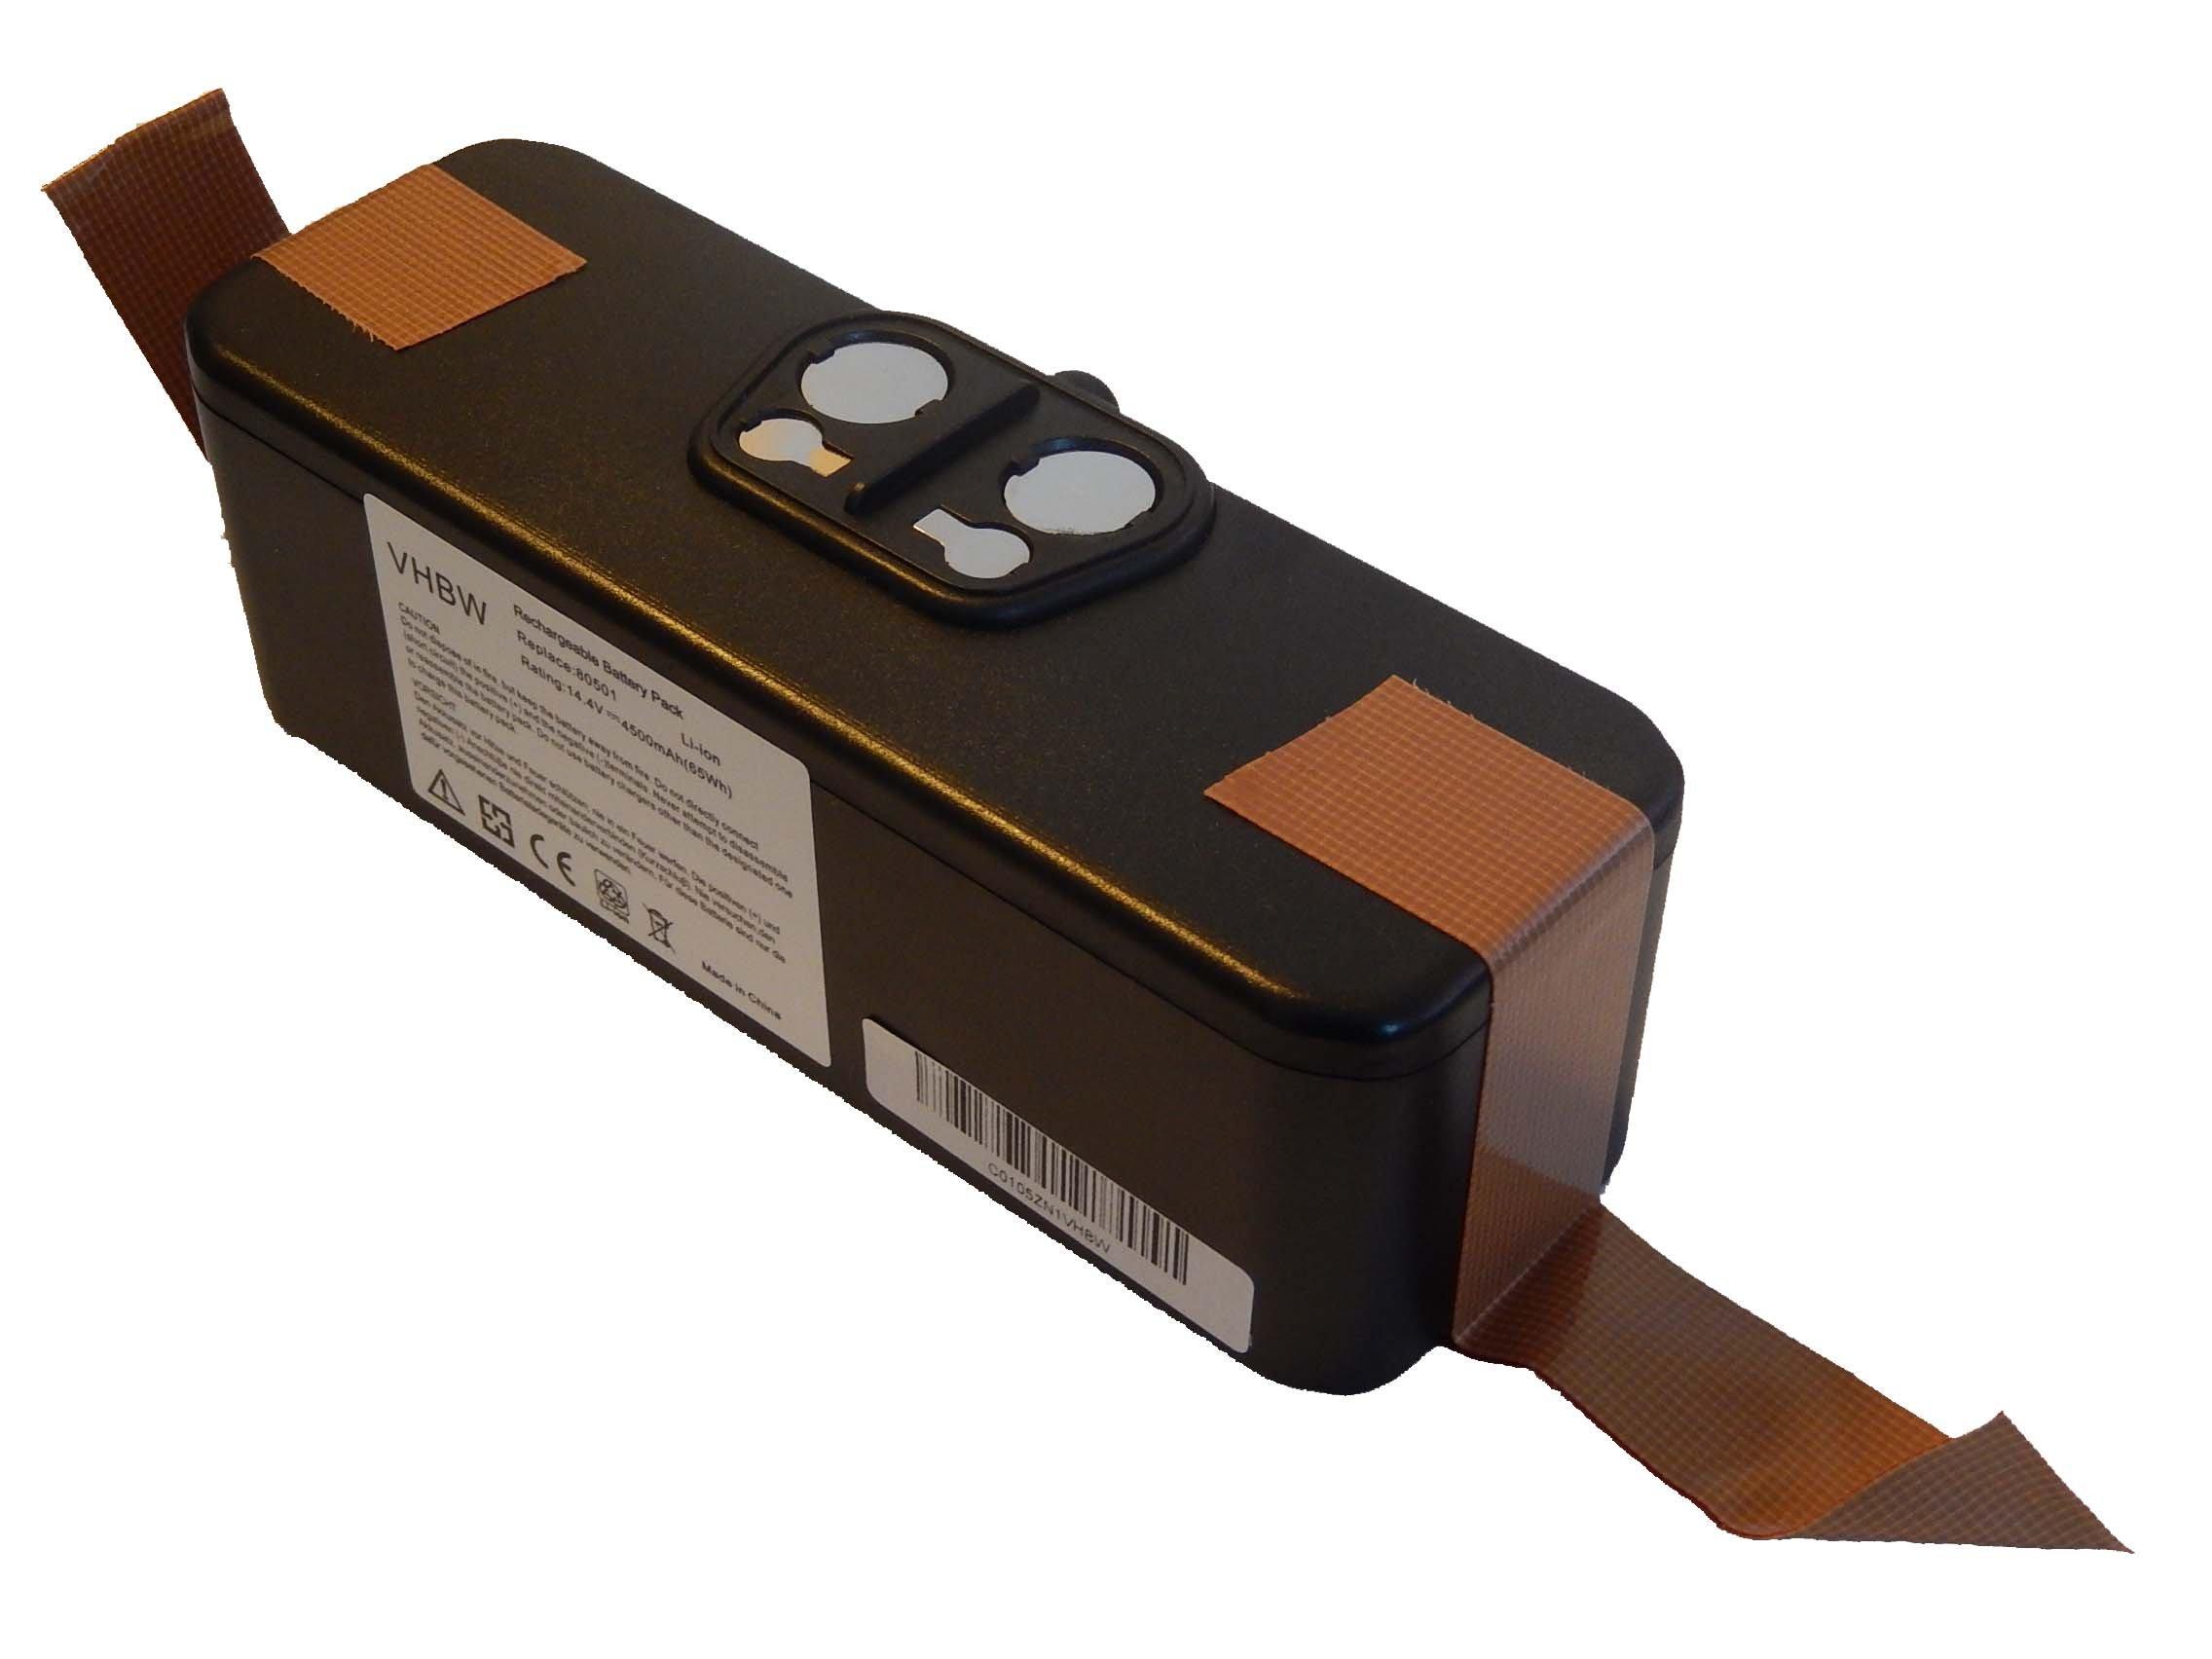 vhbw Batería Li-Ion 4500mAh (14.4V) compatible con iRobot Roomba 620, 625, 630, 650 reemplaza 11702, GD-Roomba-500.: Amazon.es: Electrónica